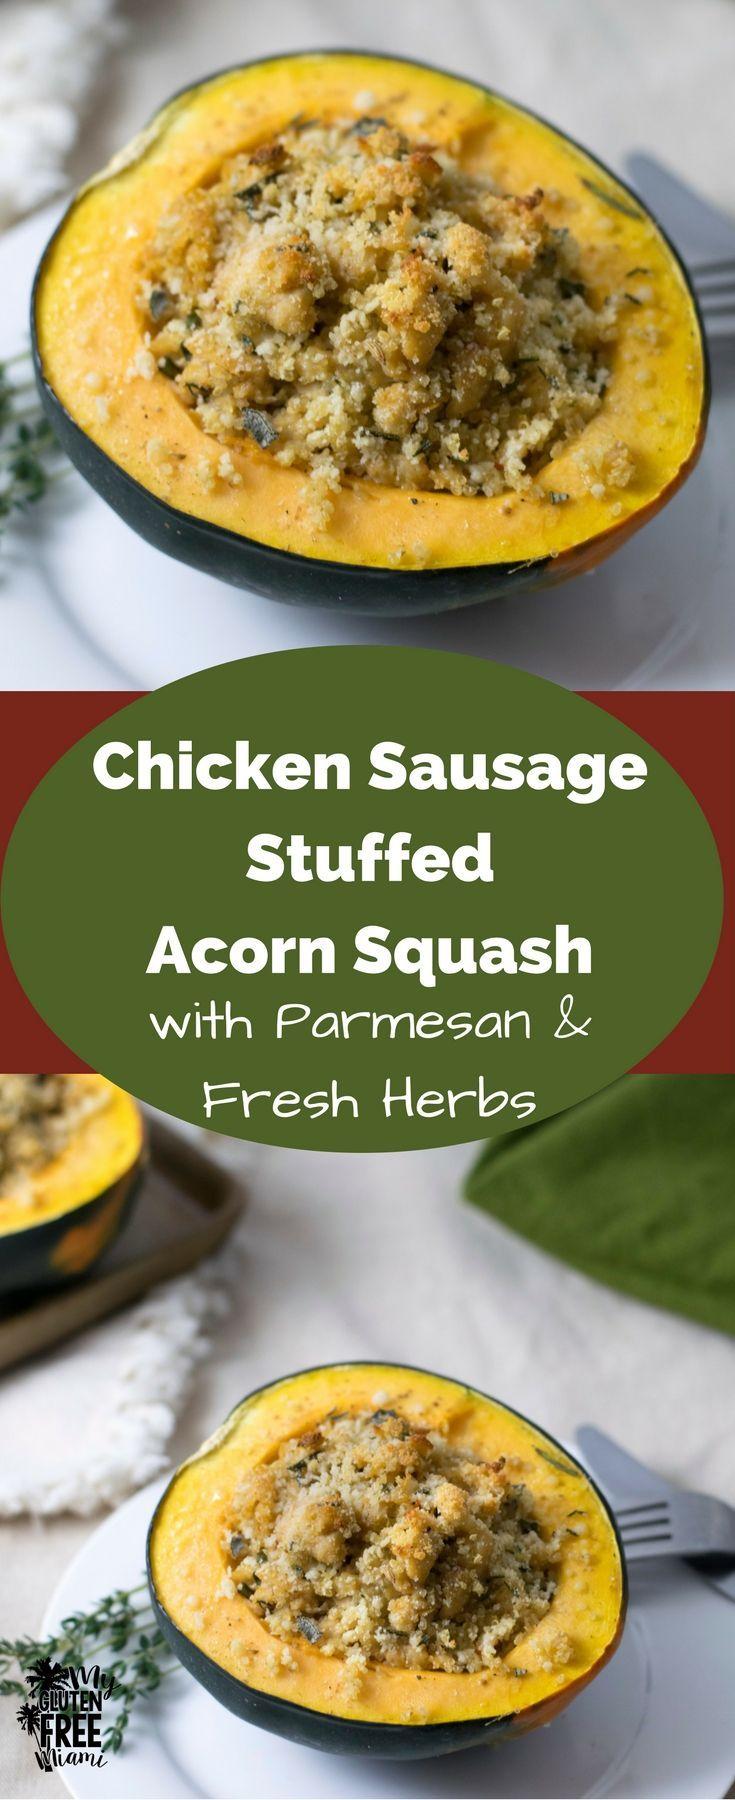 Quinoa And Chicken Sausage Stuffed Acorn Squash Gluten Free